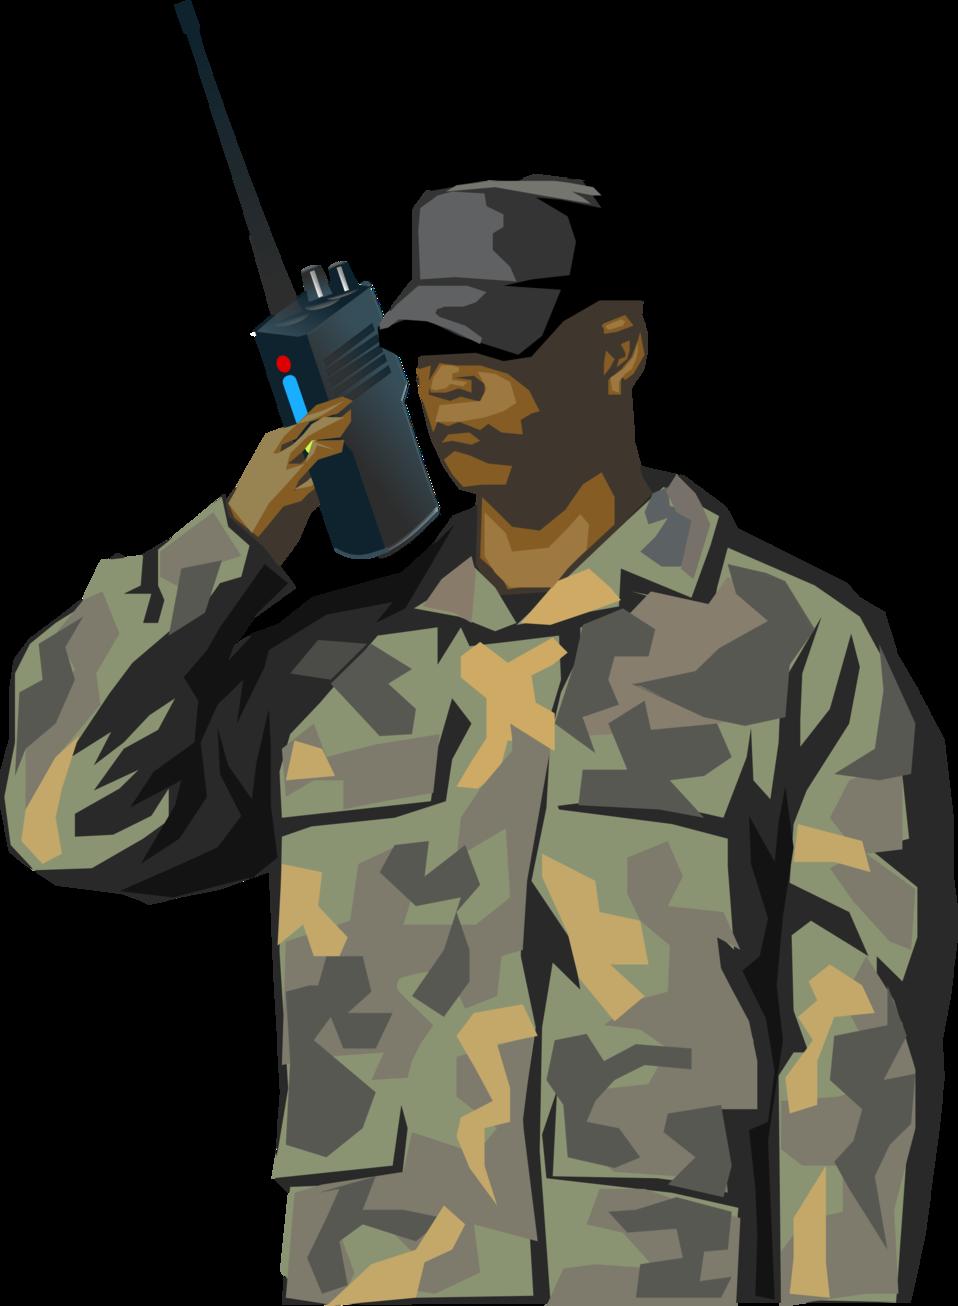 Public domain clip art. Soldiers clipart military